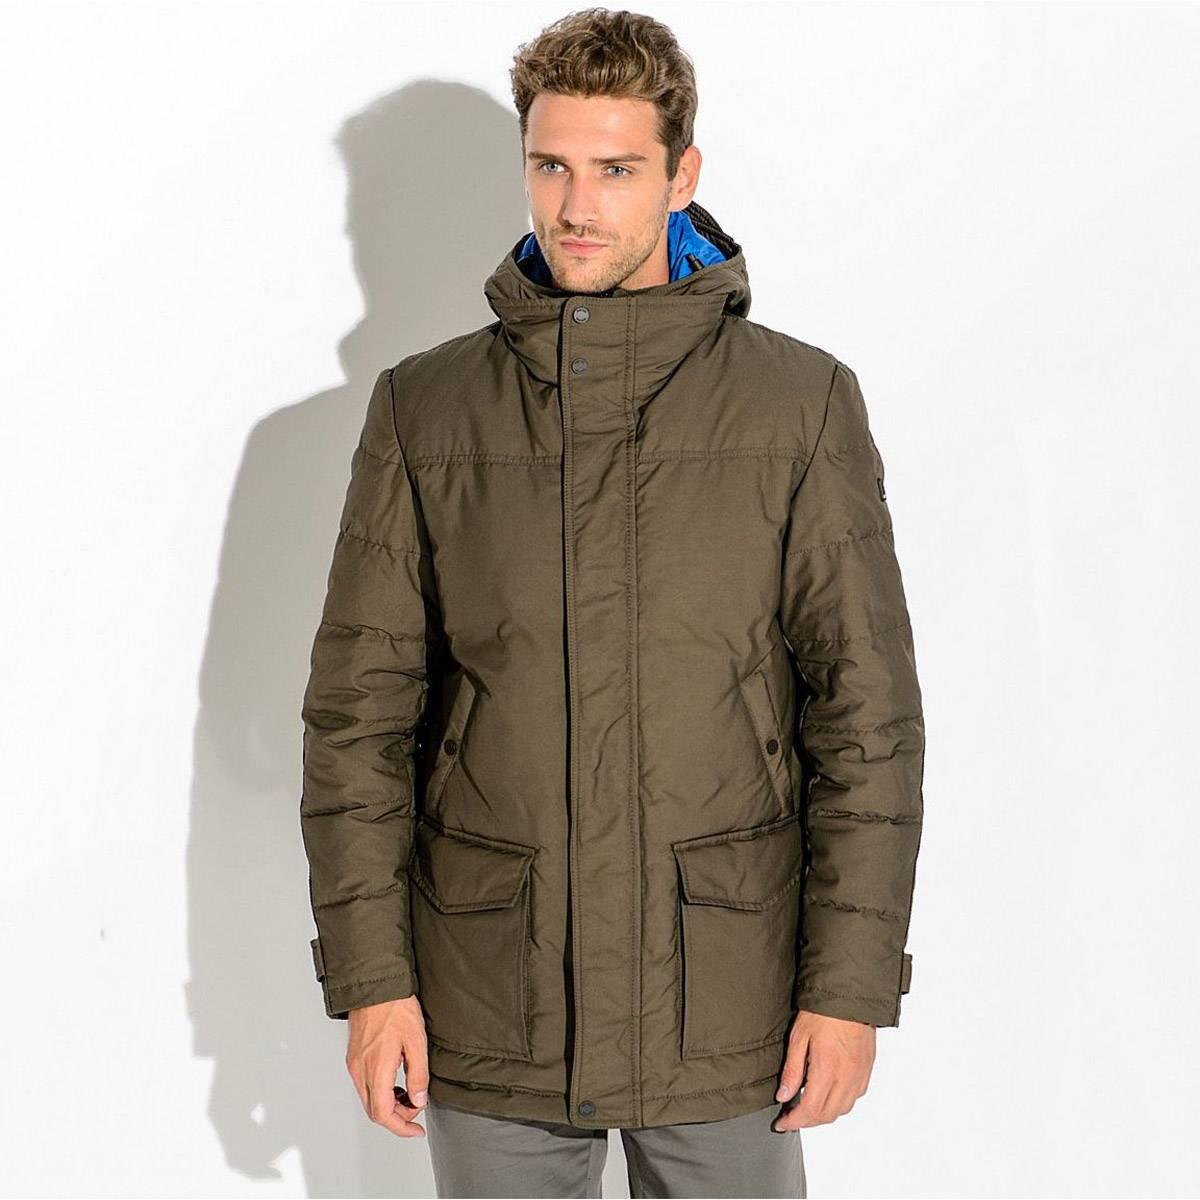 abe49de88aaea Куртка мужская Geox M4425F DARK MILITARY 52 Коричневый (M4425FDKMI) -  Интернет-магазин